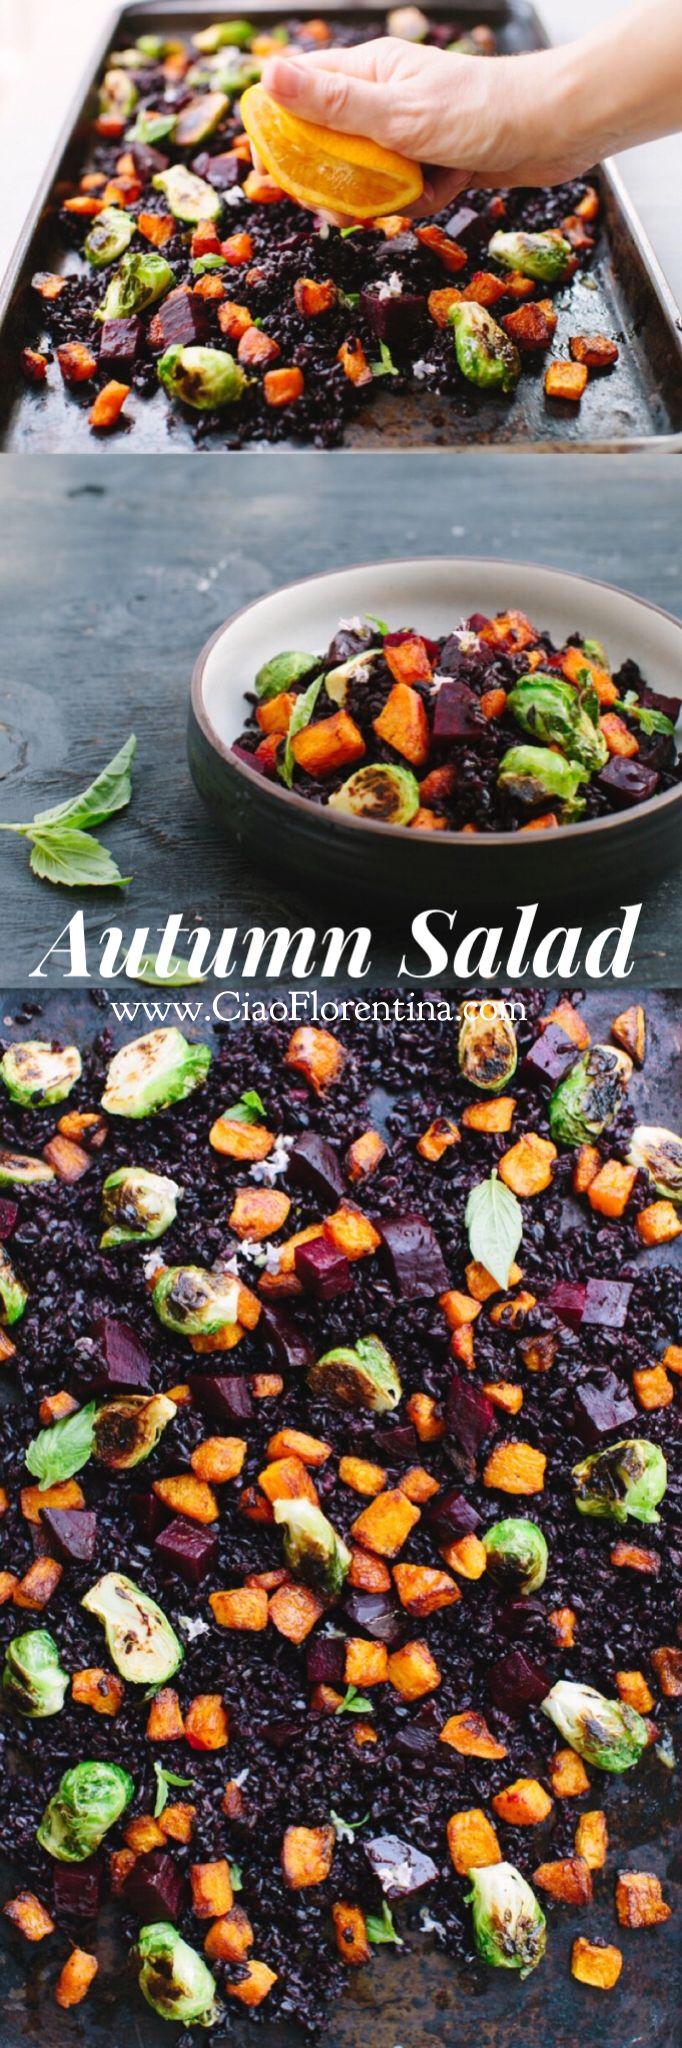 Autumn Salad Recipe | CiaoFlorentina.com @CiaoFlorentina